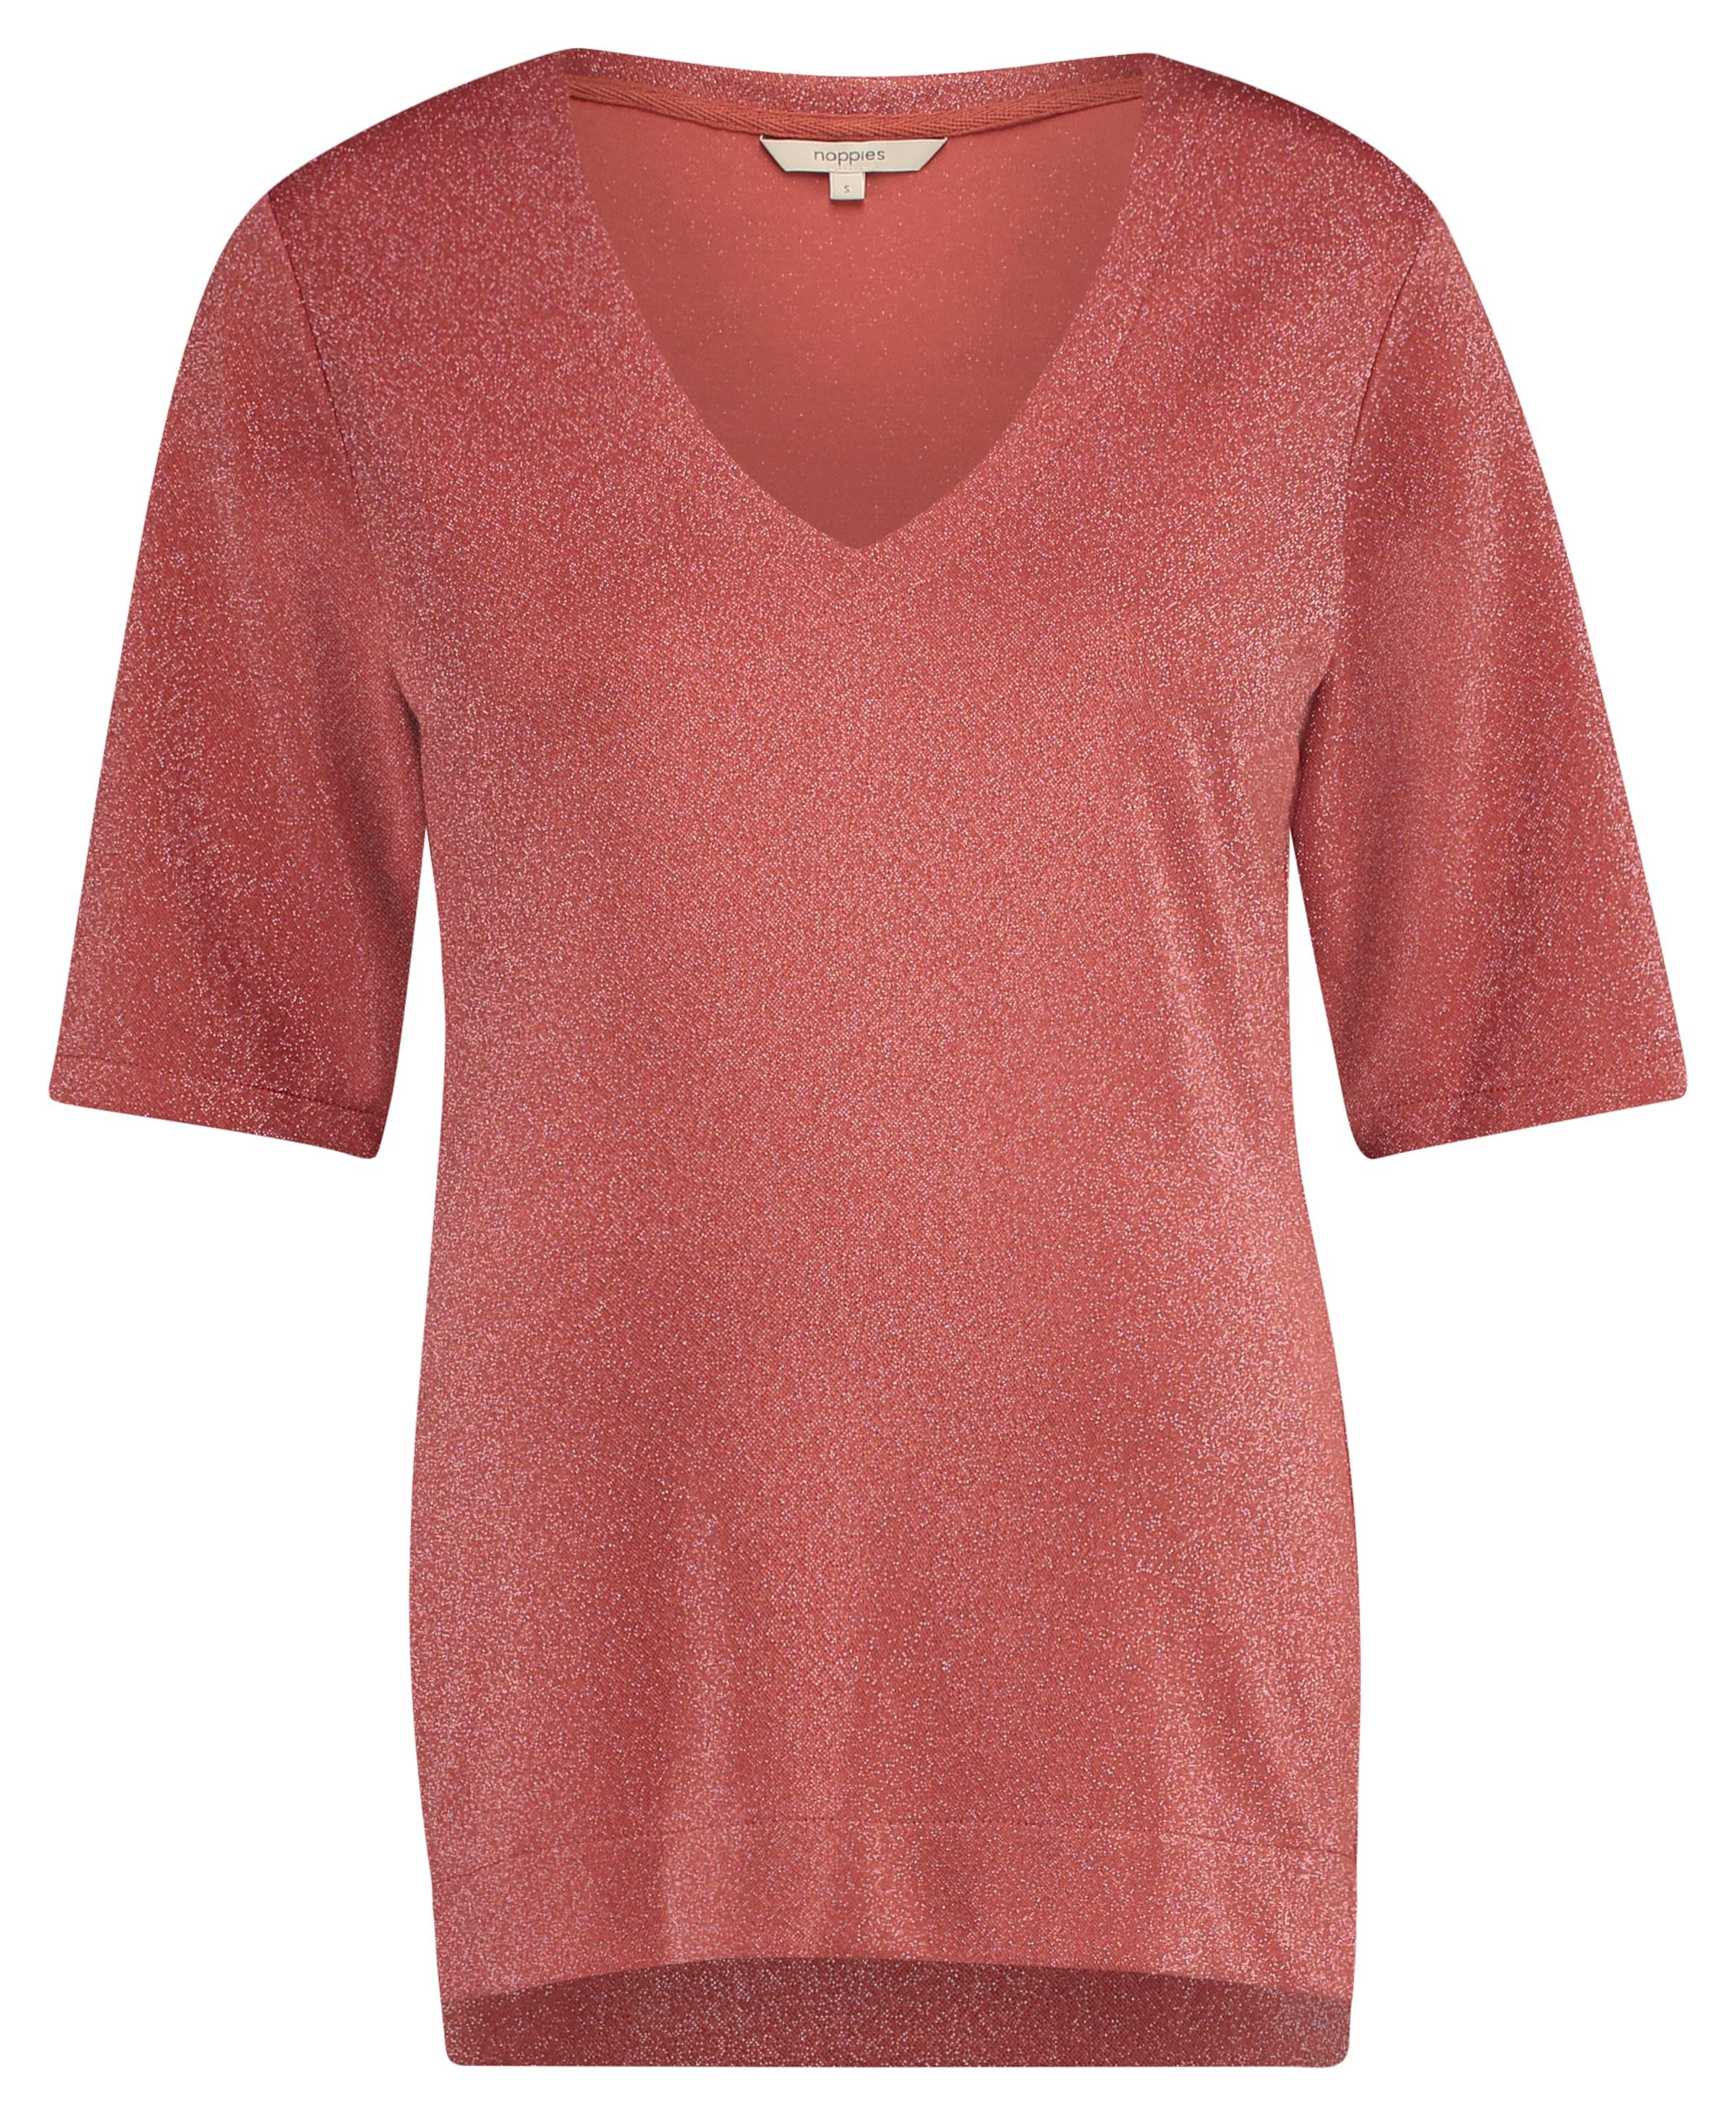 Noppies In Rostrot T shirt 'kendra' QdthCsrx